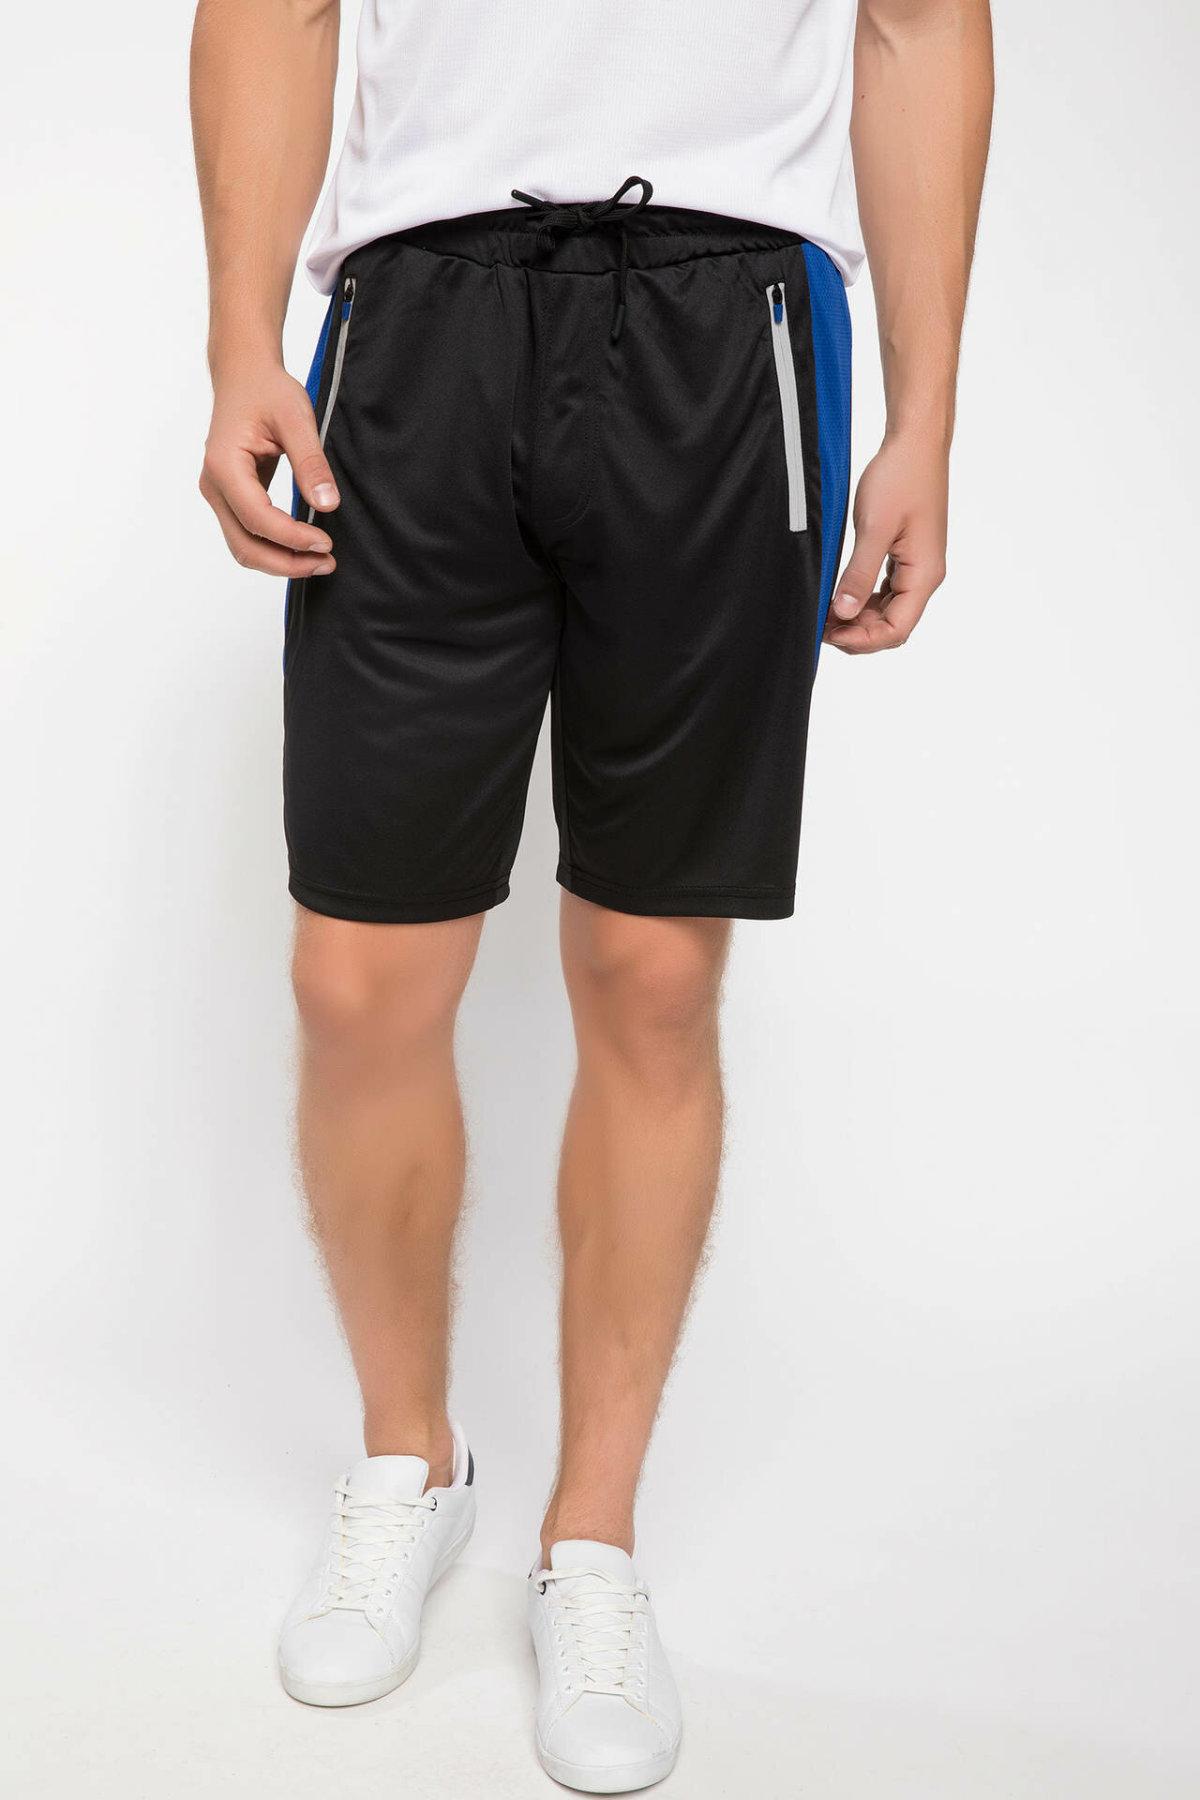 DeFacto Fashion Man Casual Drawstring Waist Short Pant Male Sport Bottoms For Men's Striped Sweatpants Summer New- J0948AZ18AU